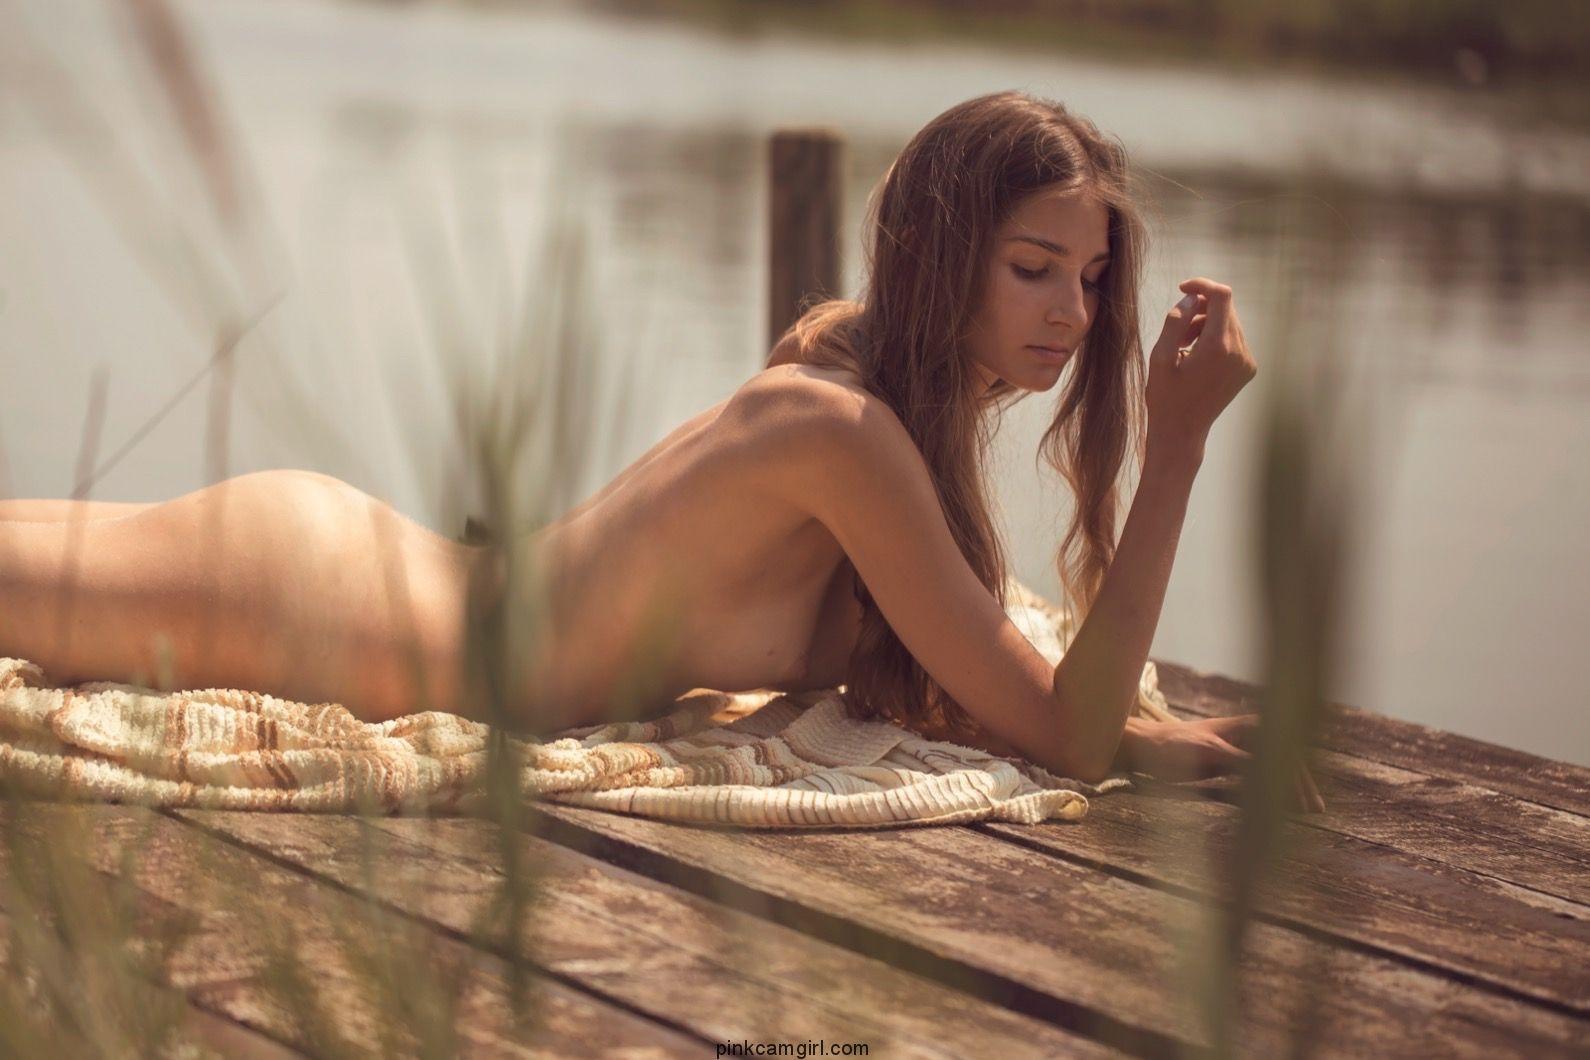 Nude Jennifer Berg nudes (75 photo), Tits, Bikini, Instagram, swimsuit 2015